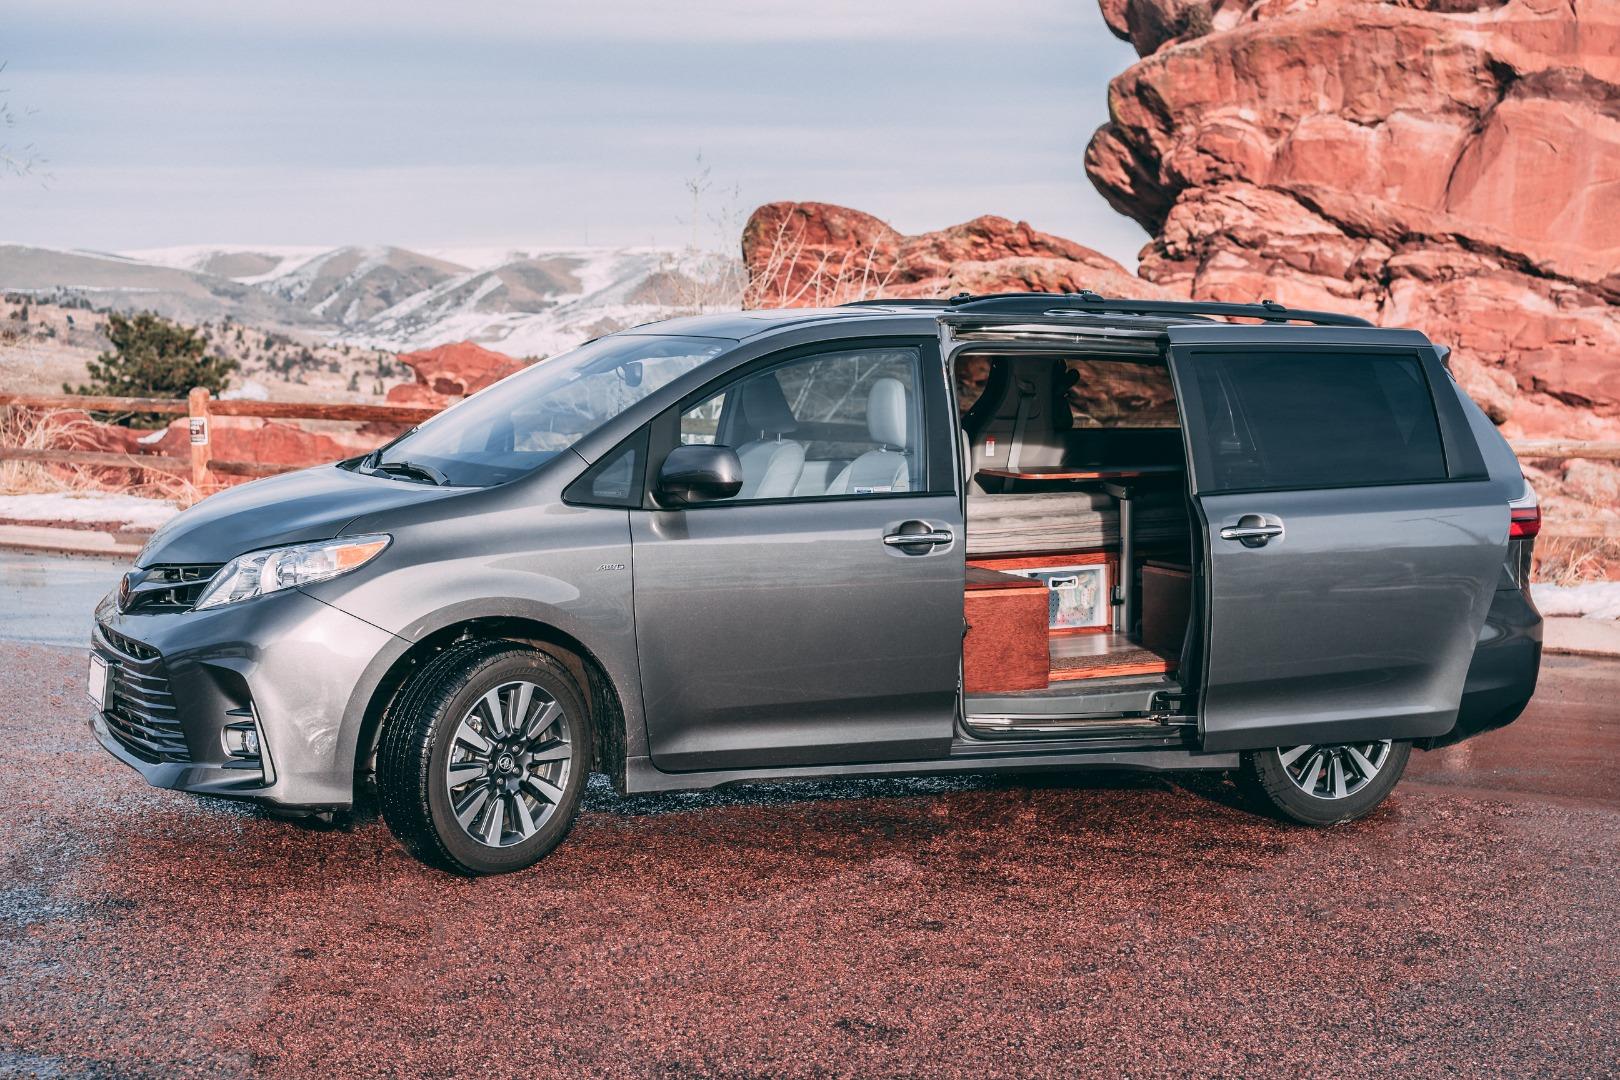 Colorado shop cures wanderlust by turning minivans into cozy mini-campervans